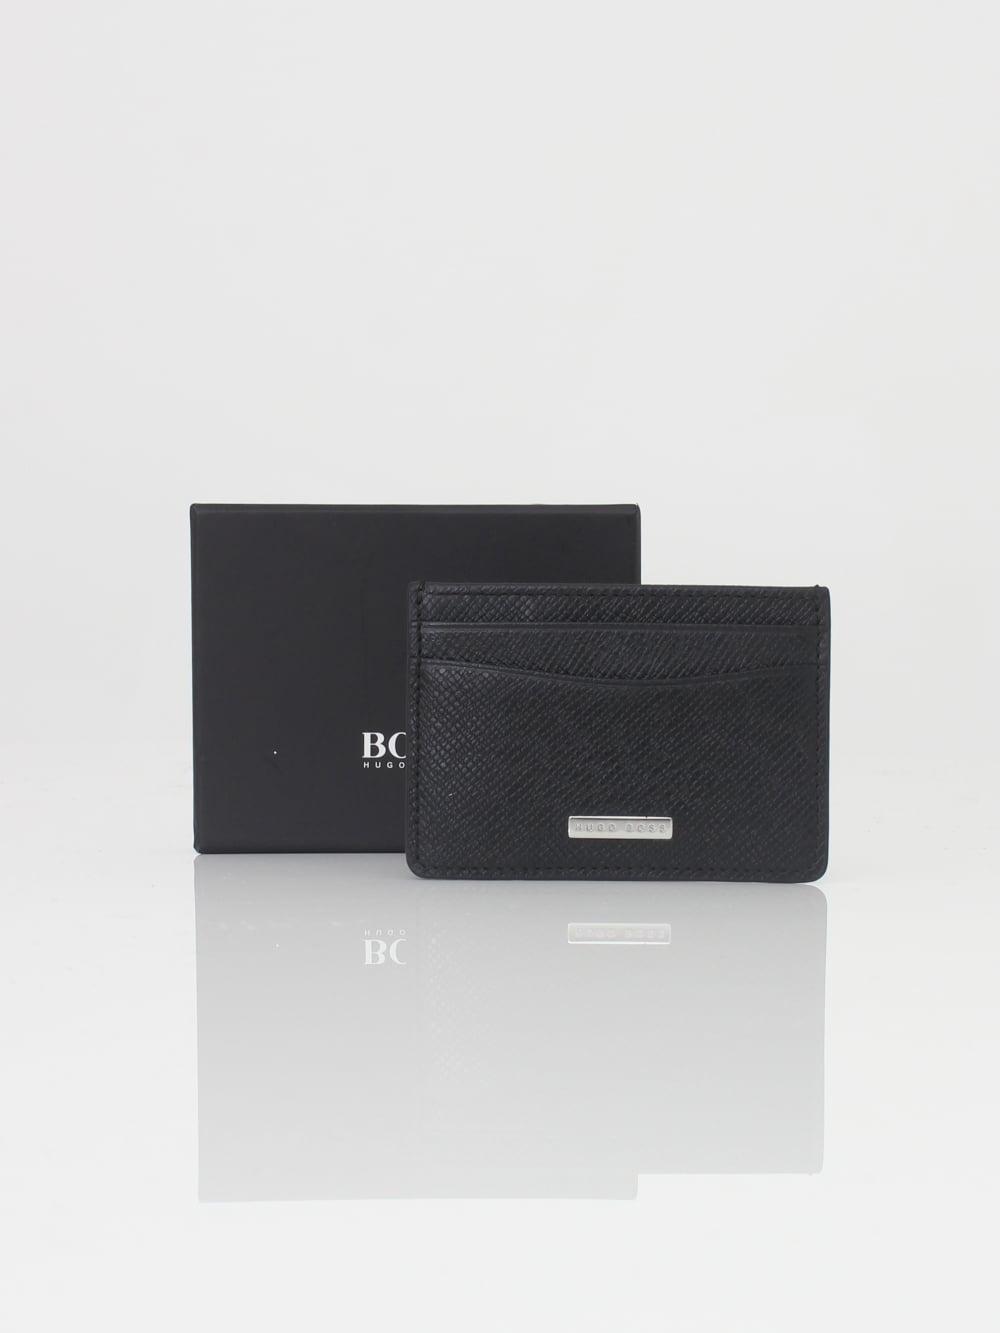 e998c0b17c HUGO BOSS Signature Money Clip Wallet in Black - Northern Threads